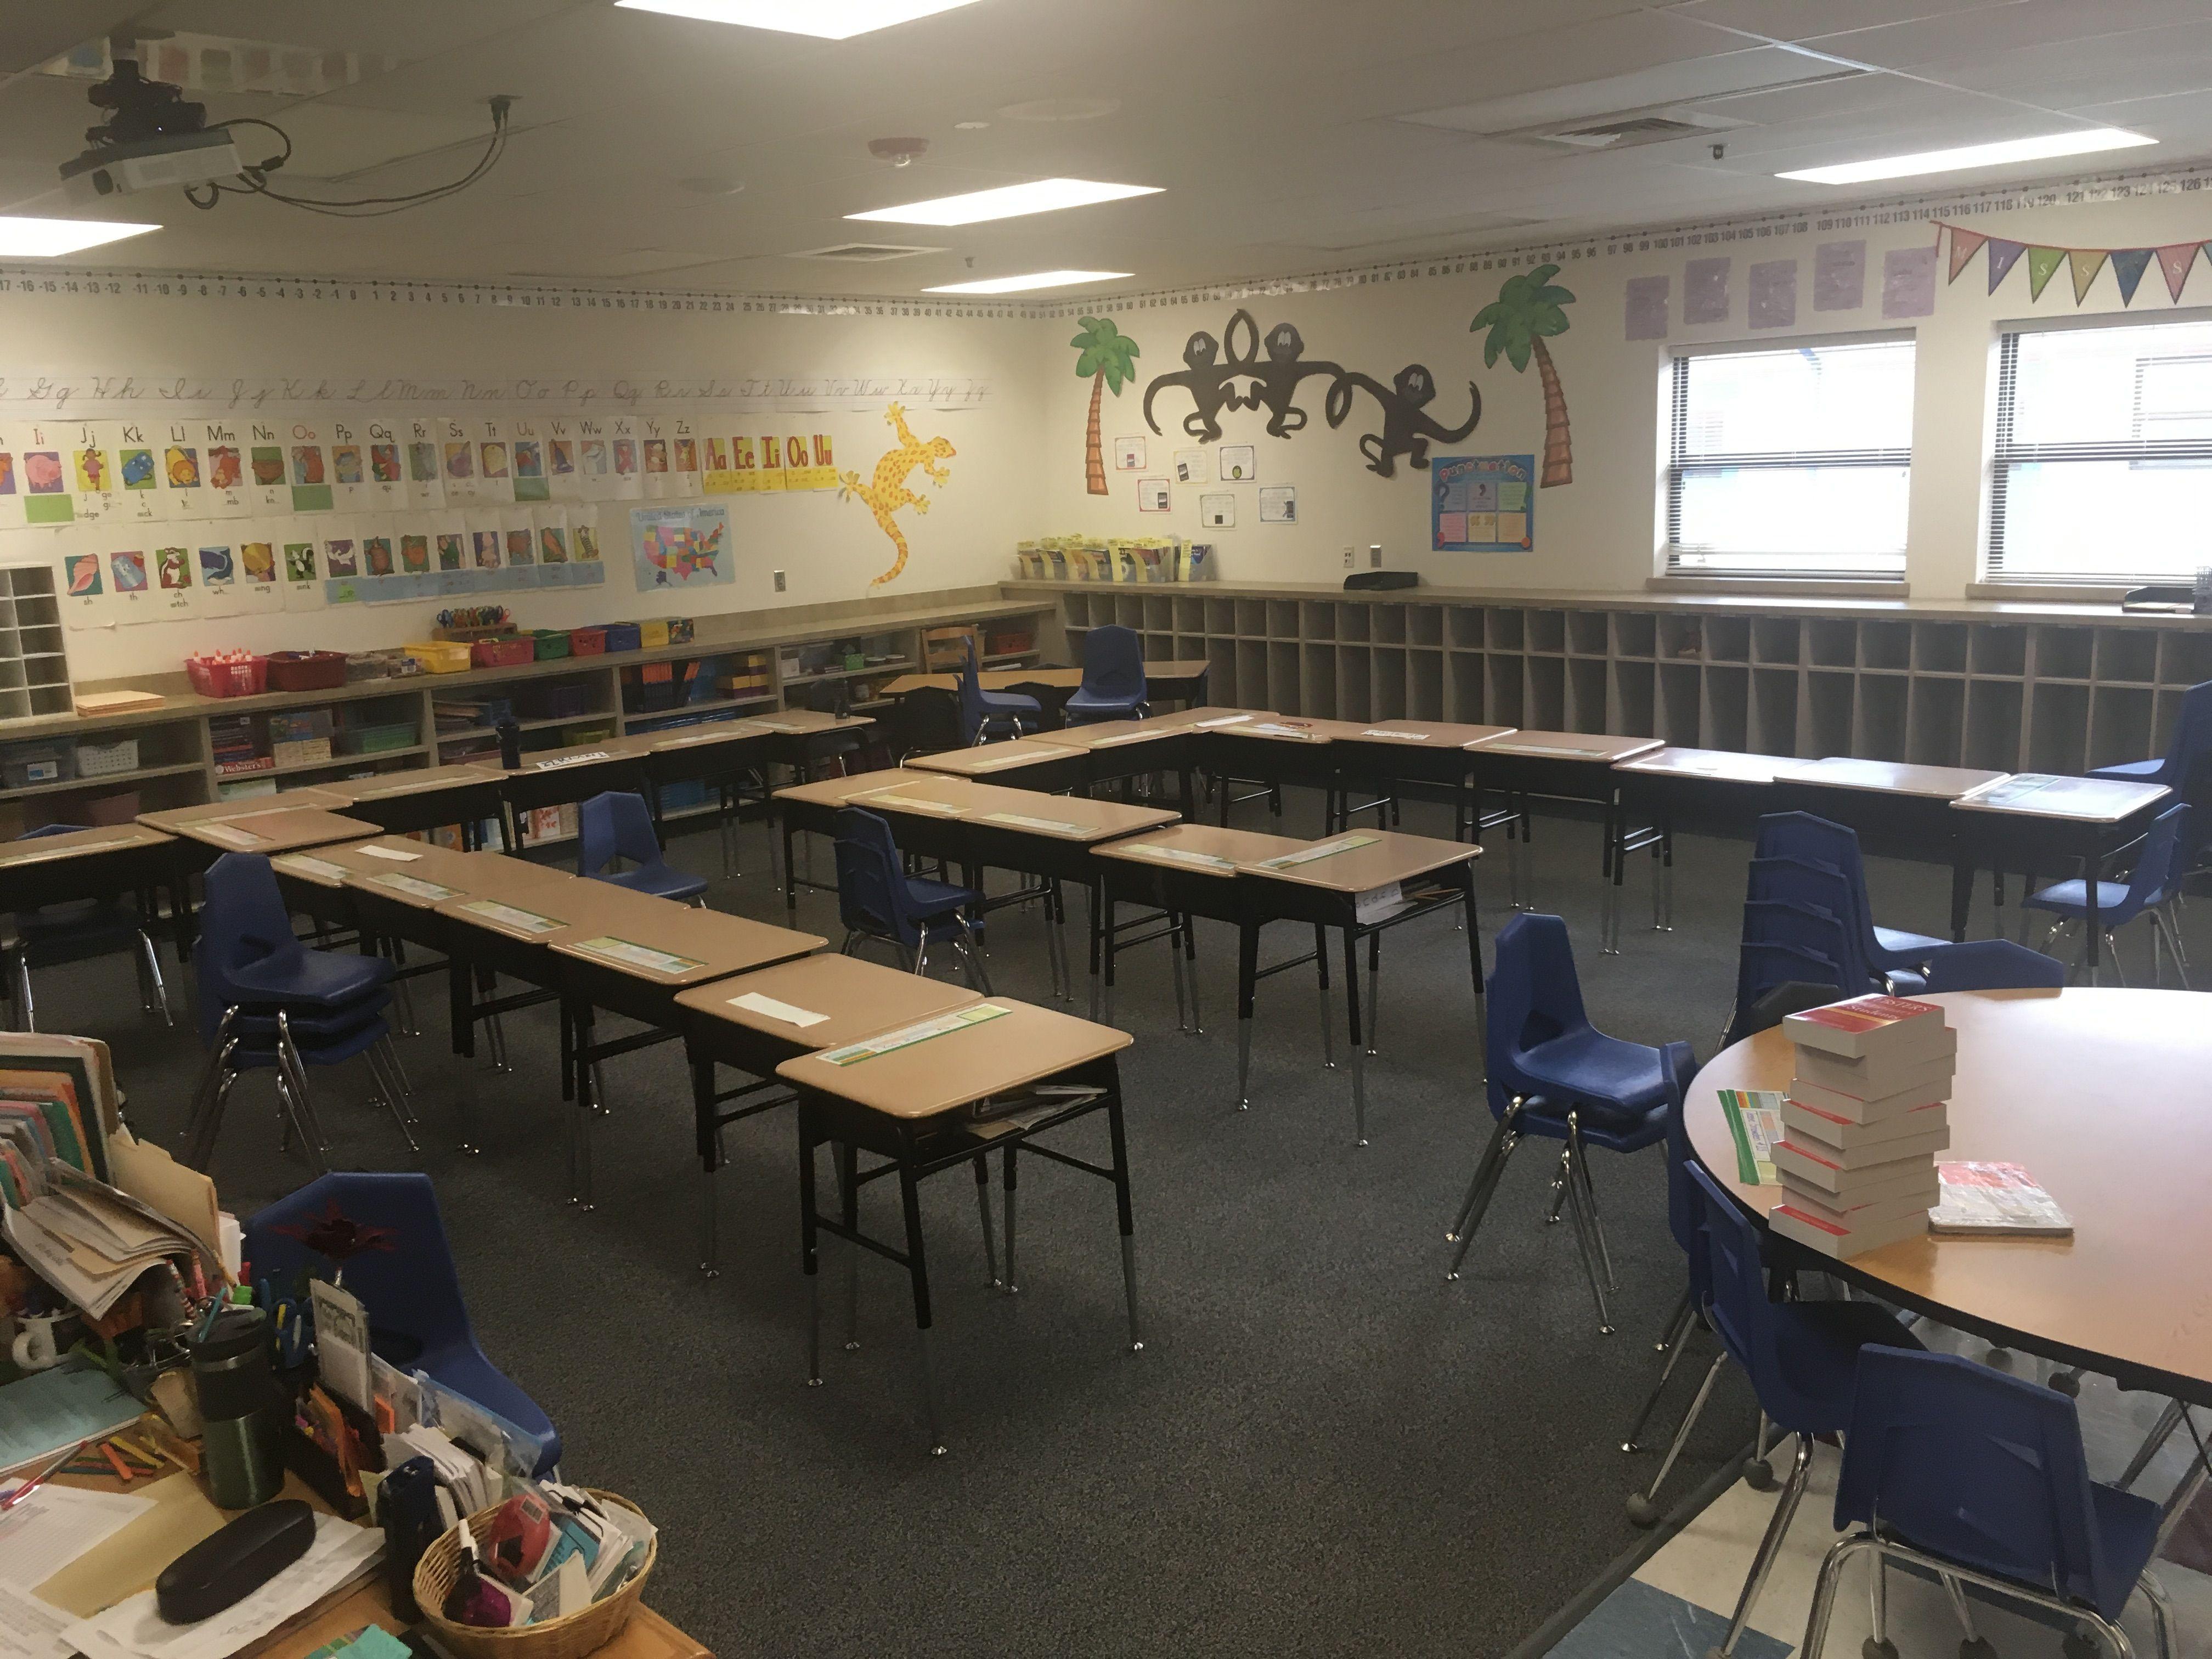 Classroom Desk Arrangement, Desk Arrangements, Desks, Tables, Bureaus,  Table Seating, Office Desks, Working Tables, Office Desk